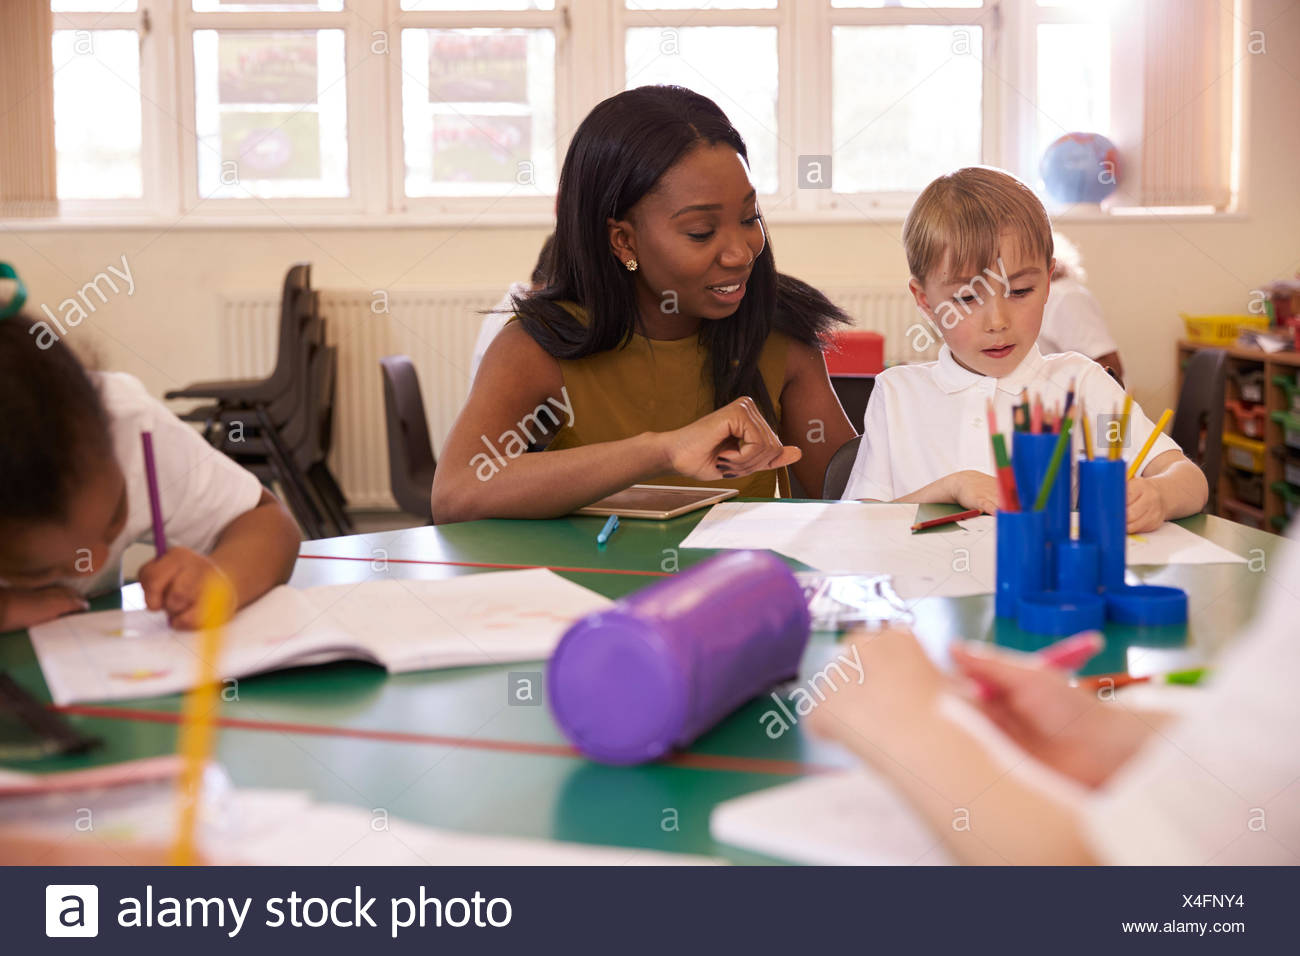 Elementary School Teacher Helping Male Pupil At Desk - Stock Image